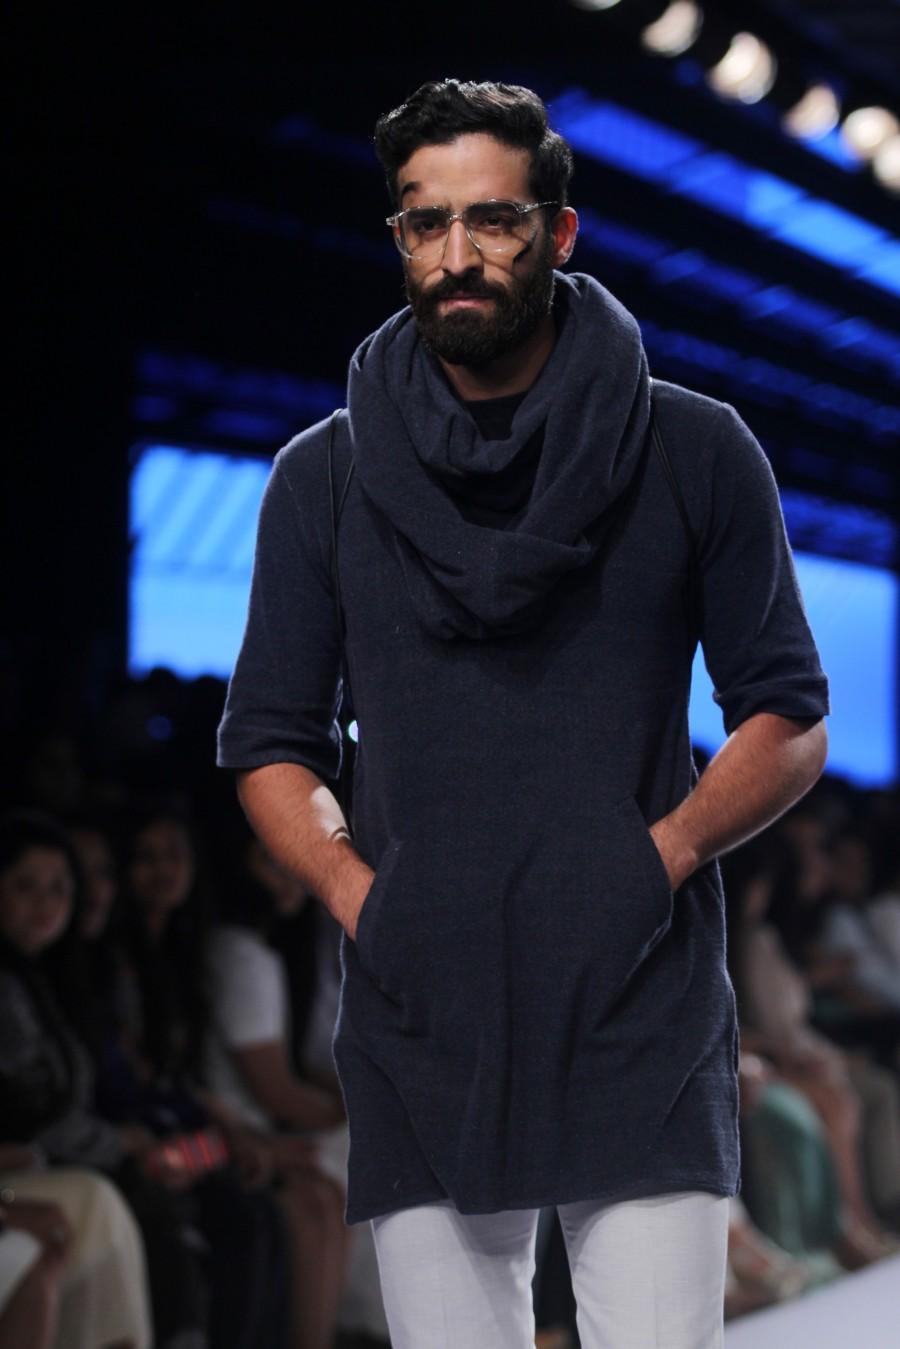 Lakme Fashion Week 2015,LFW2015,#LakmeFashionWeek2015,new generation,debut designers,bollywood,photos